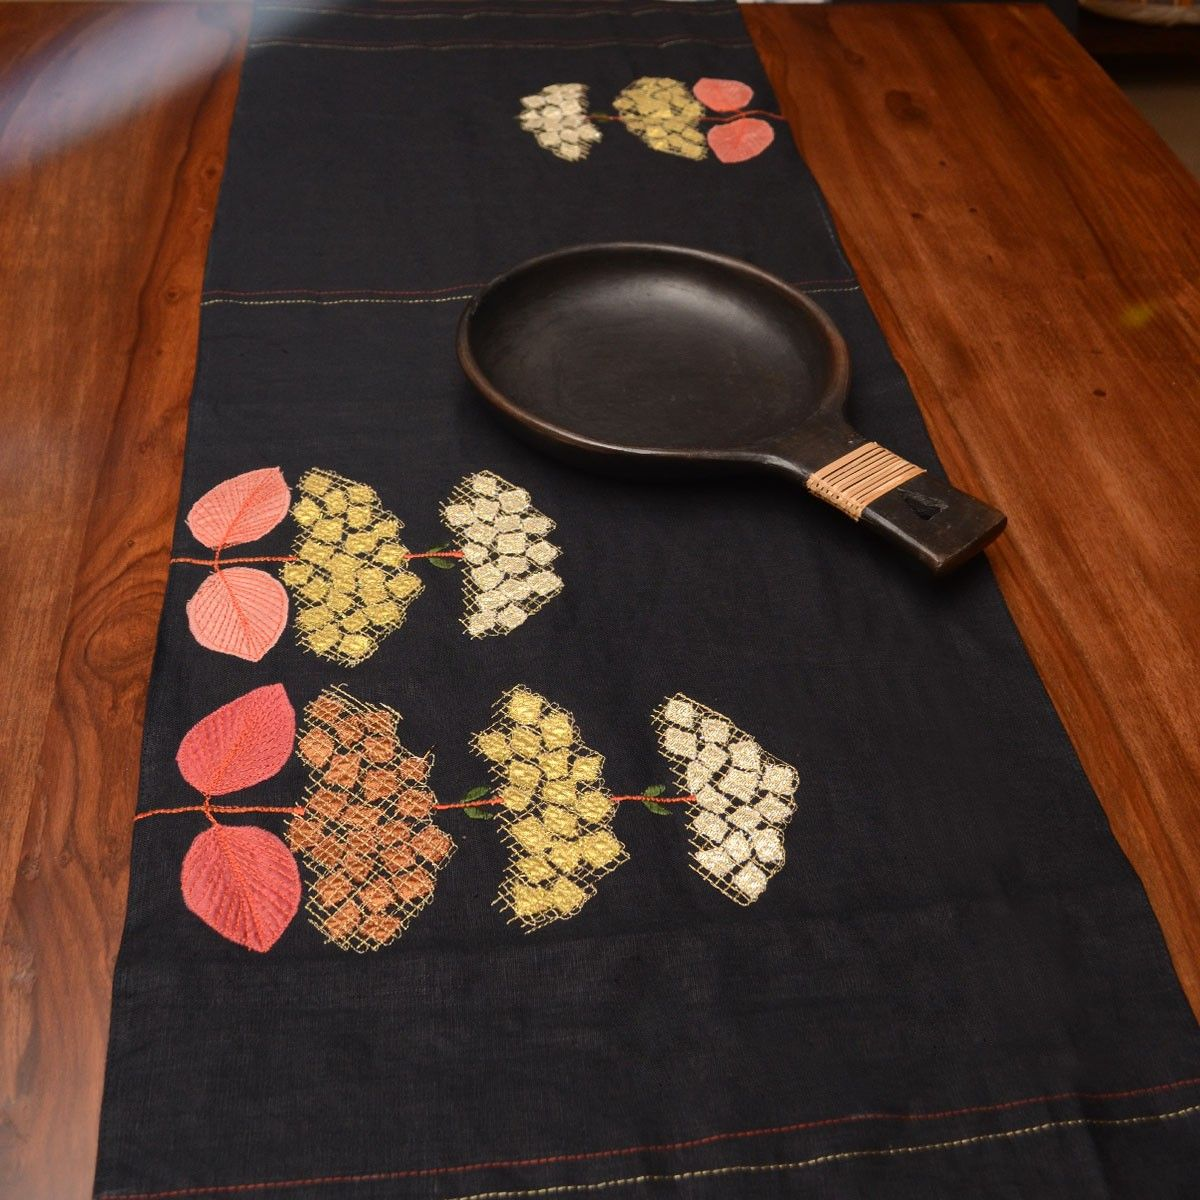 Linen Table Runner, Black Color - 16 x 58 Inch